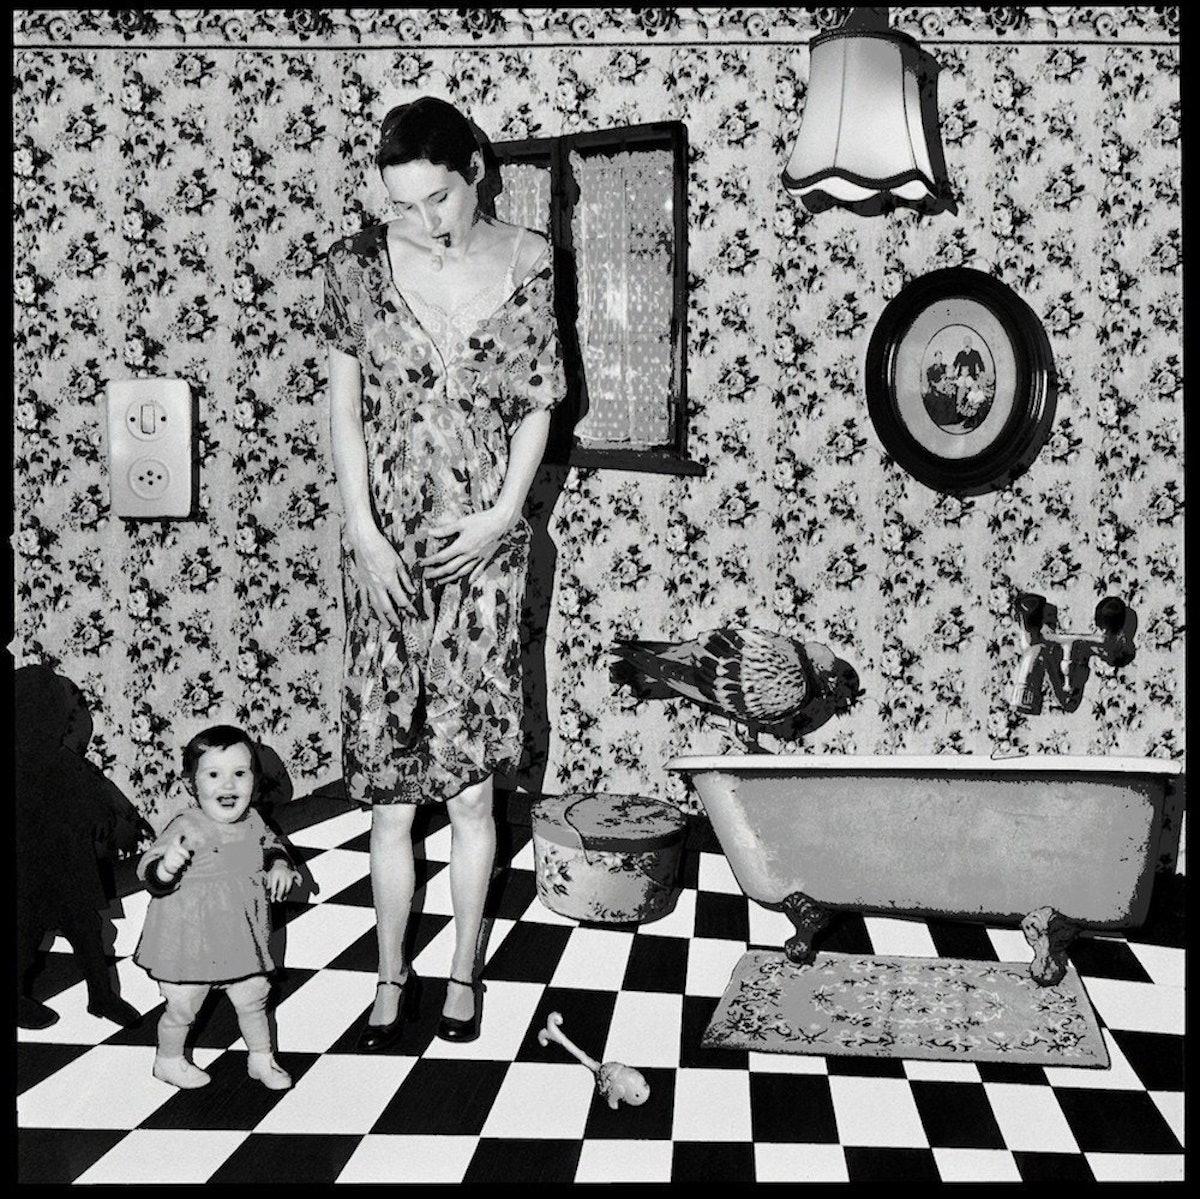 CORNELIA HEDIGER - Bathtub, 2015 - The Untitled Space - SELF REFLECTION exhibit.jpg